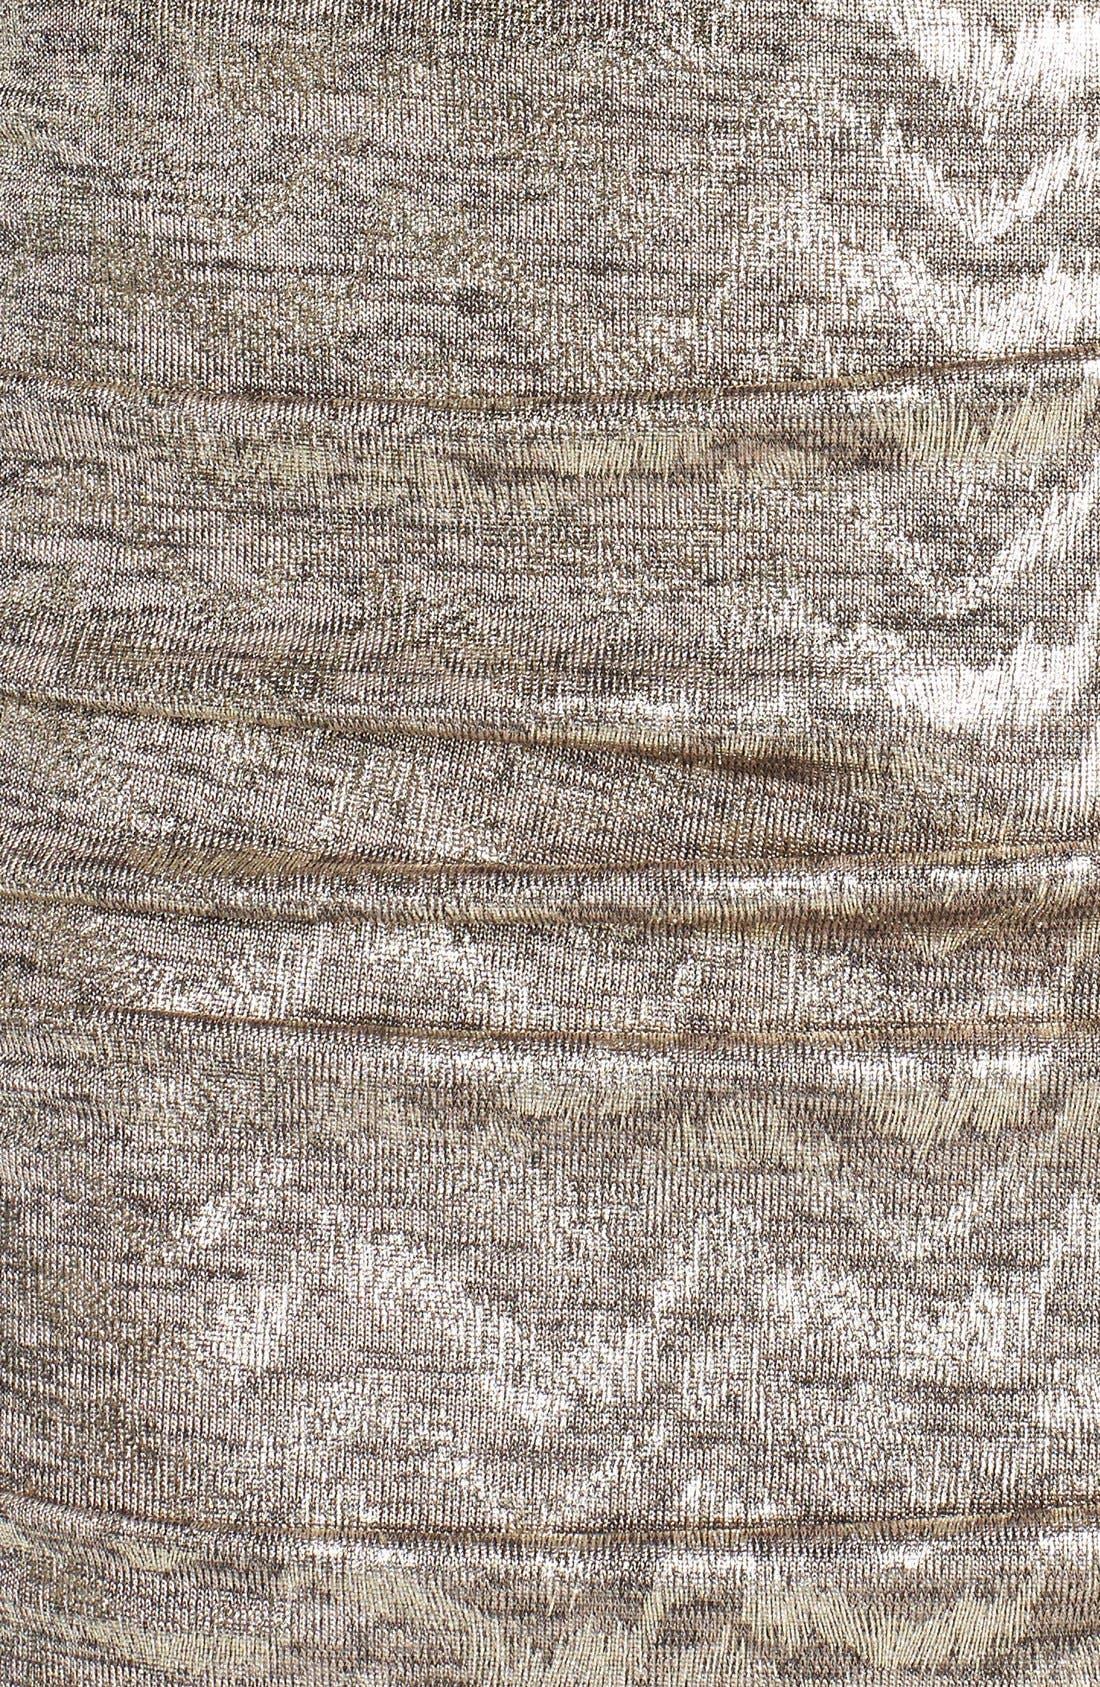 VINCE CAMUTO, Metallic Jersey Body-Con Dress, Alternate thumbnail 5, color, 710